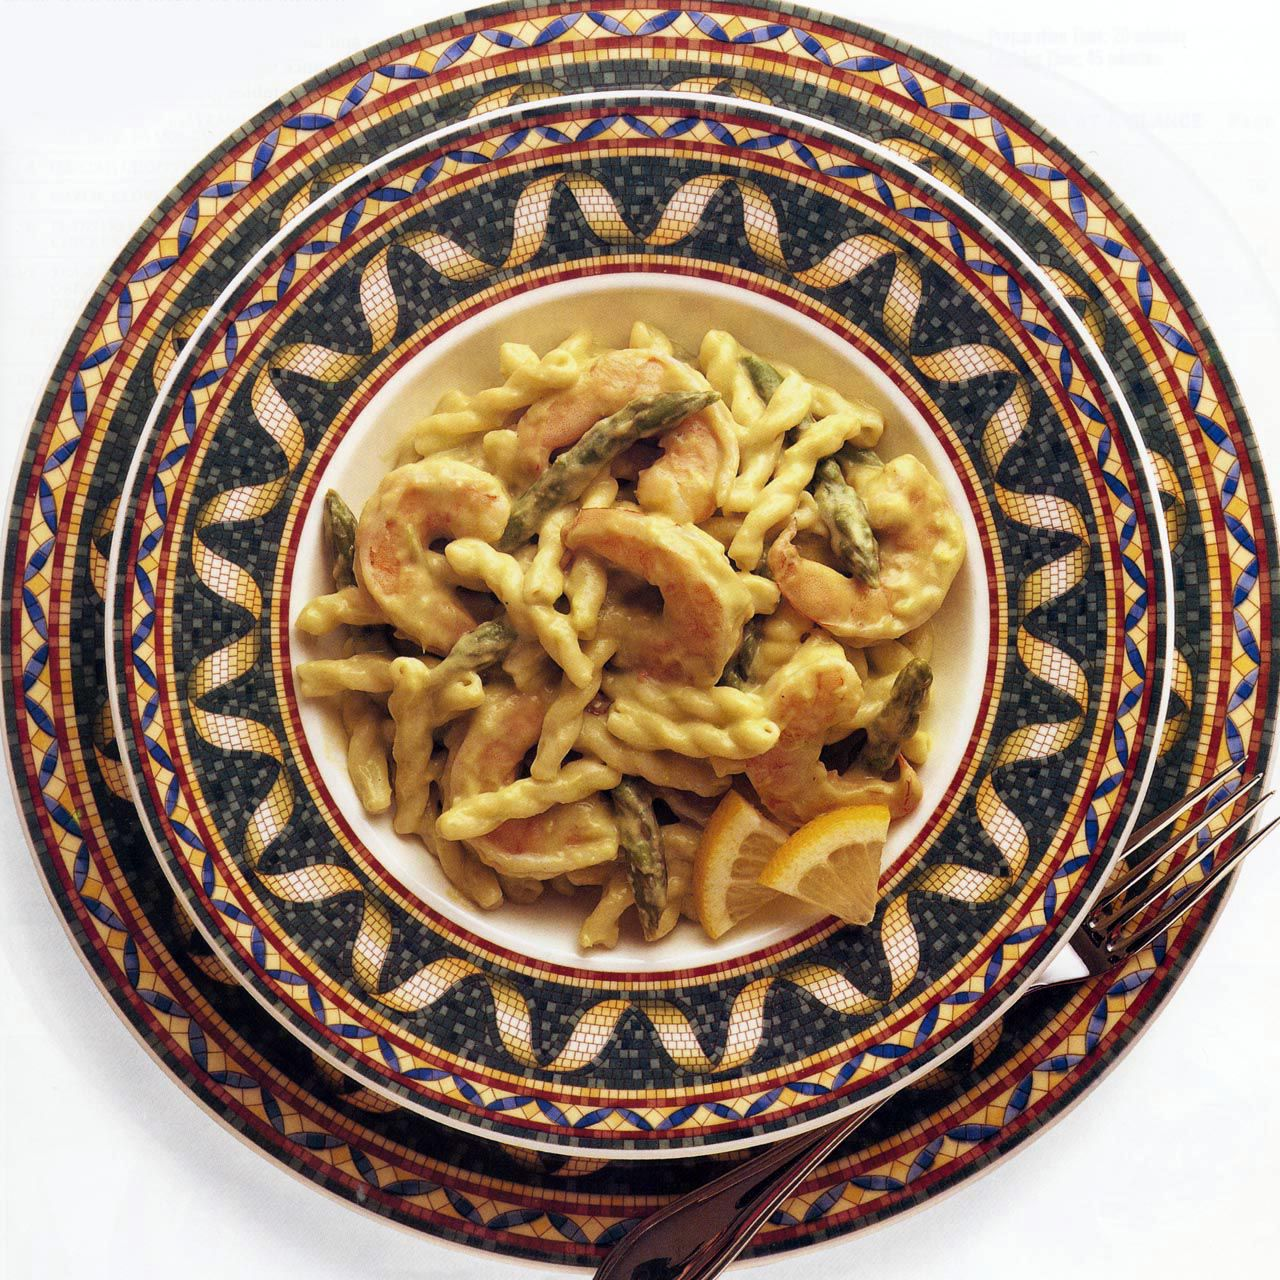 Pasta and Shrimp in Asparagus Sauce